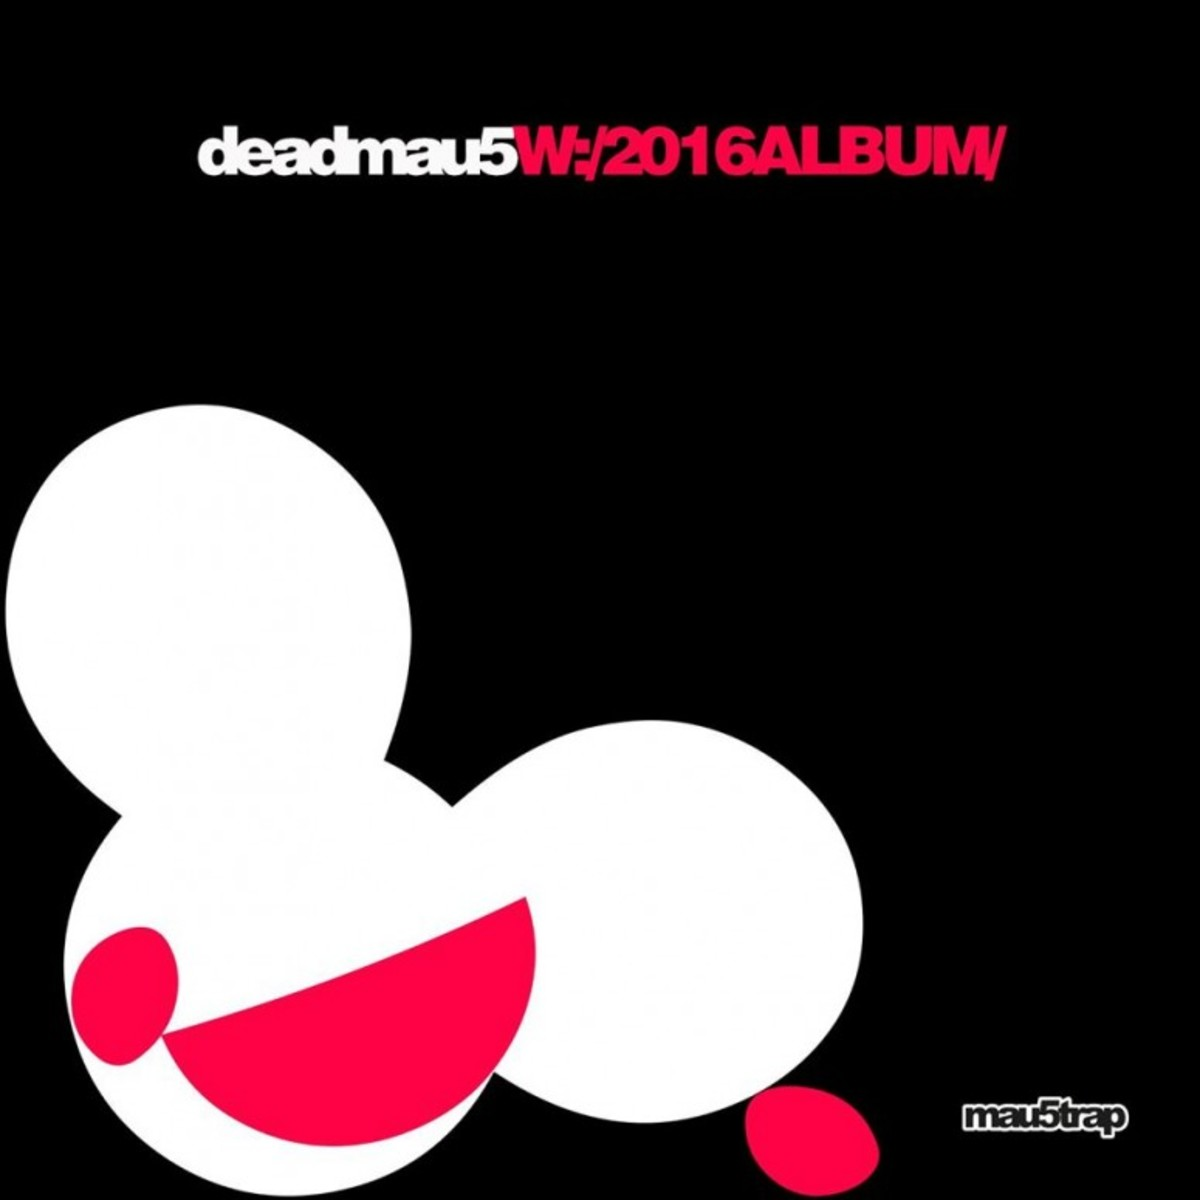 deadmau5-w-2016album.jpg